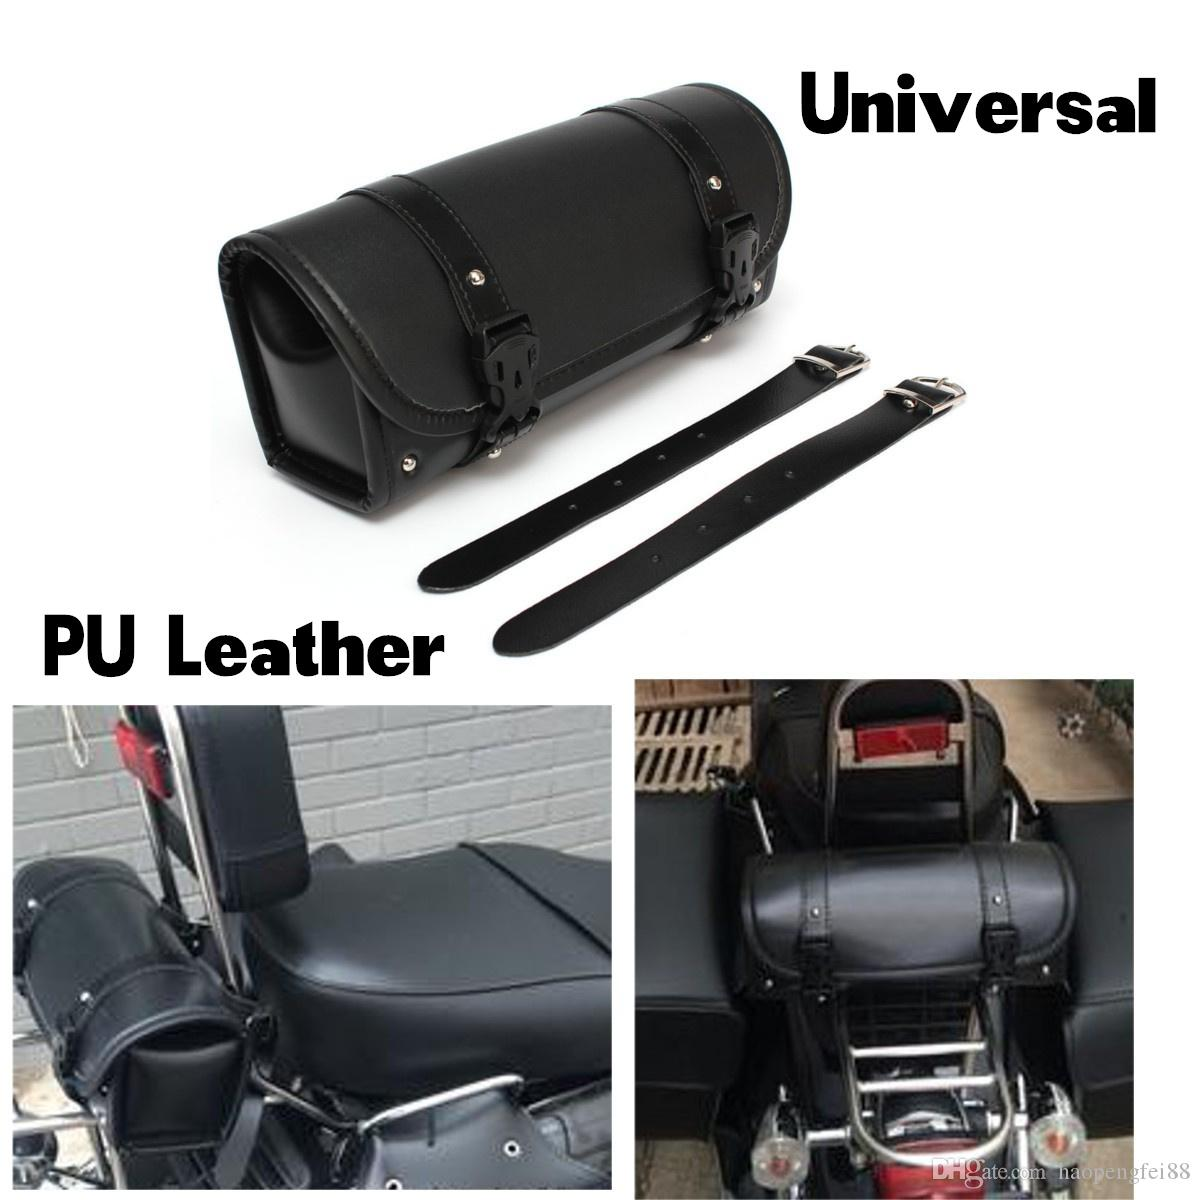 Motorcycle Tool Bag >> Universal Motorcycle Tool Bag Pu Leather Luggage Handle Bar Round